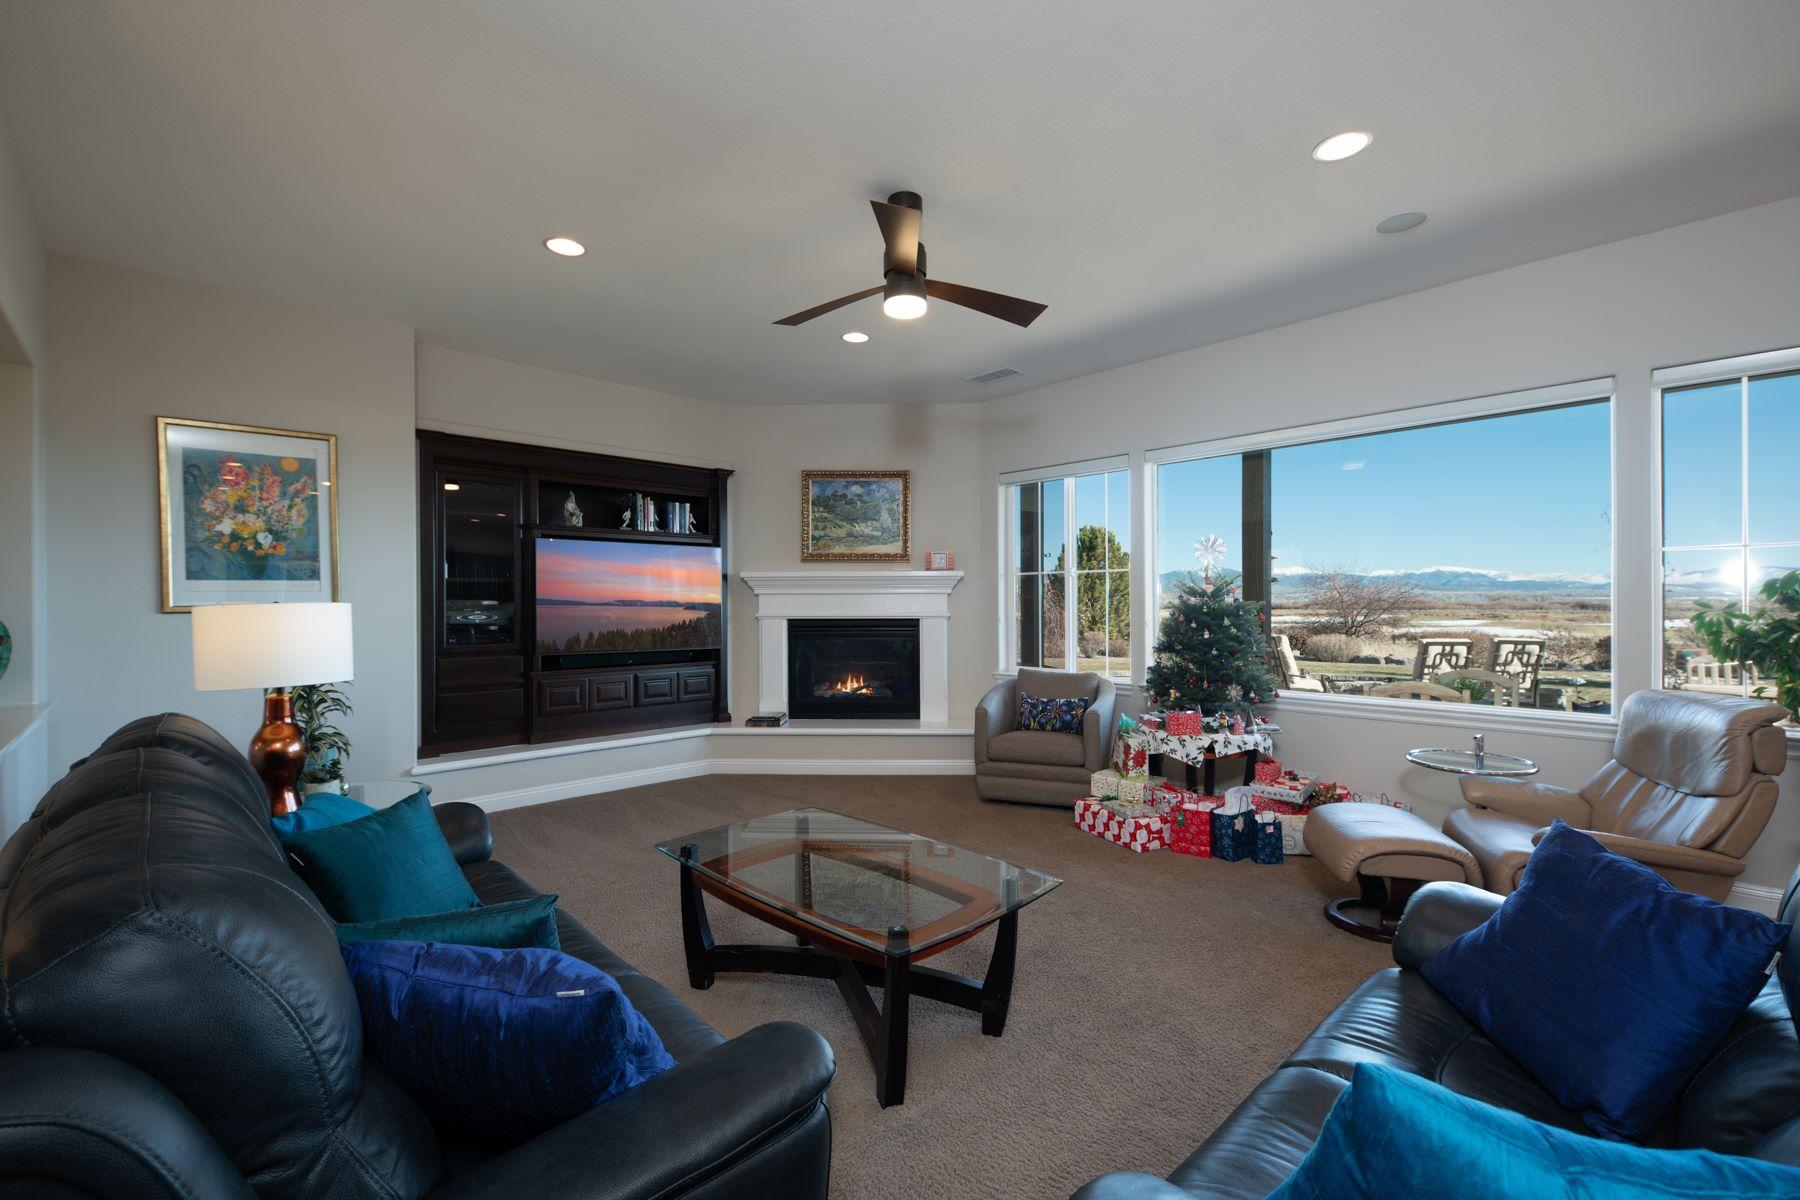 Additional photo for property listing at 2897 Cloudburst Canyon Genoa, Nevada 89411 United States